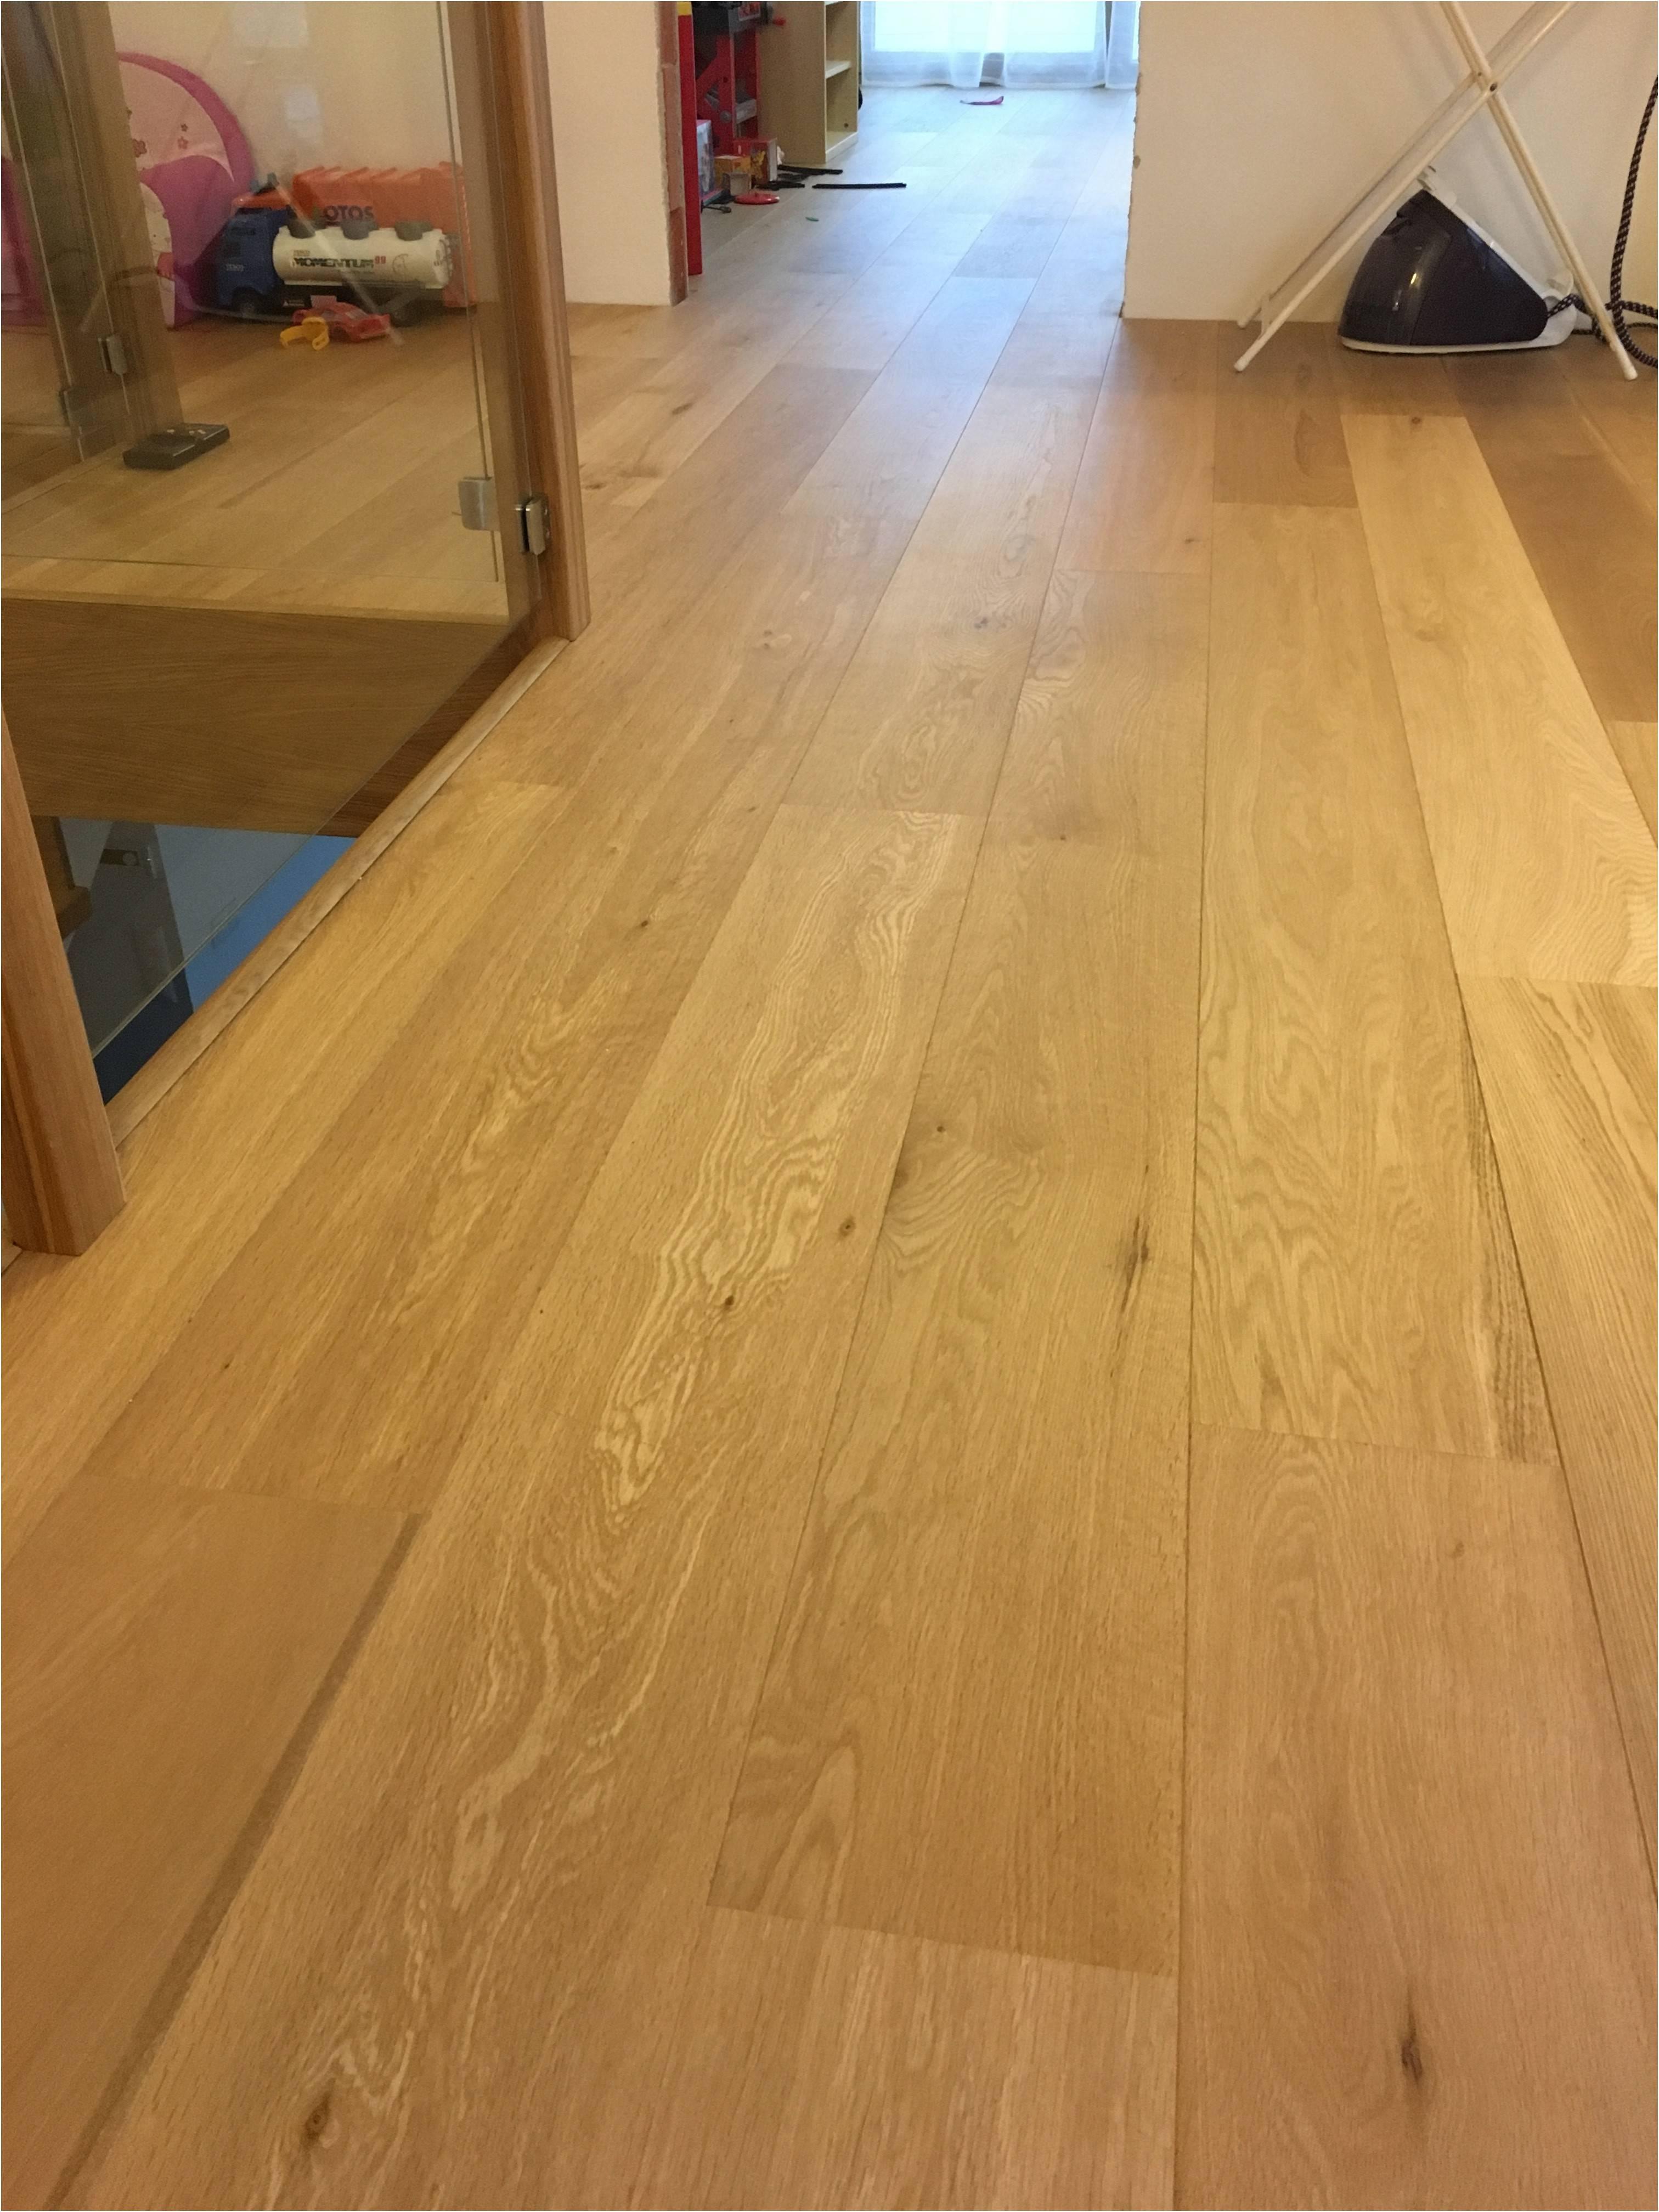 hardwood floor over carpet of how much is laminate flooring best of carpet vinyl flooring intended for how much is laminate flooring best of naturalny dub od belgickaho vac2bdrobcu lamett of